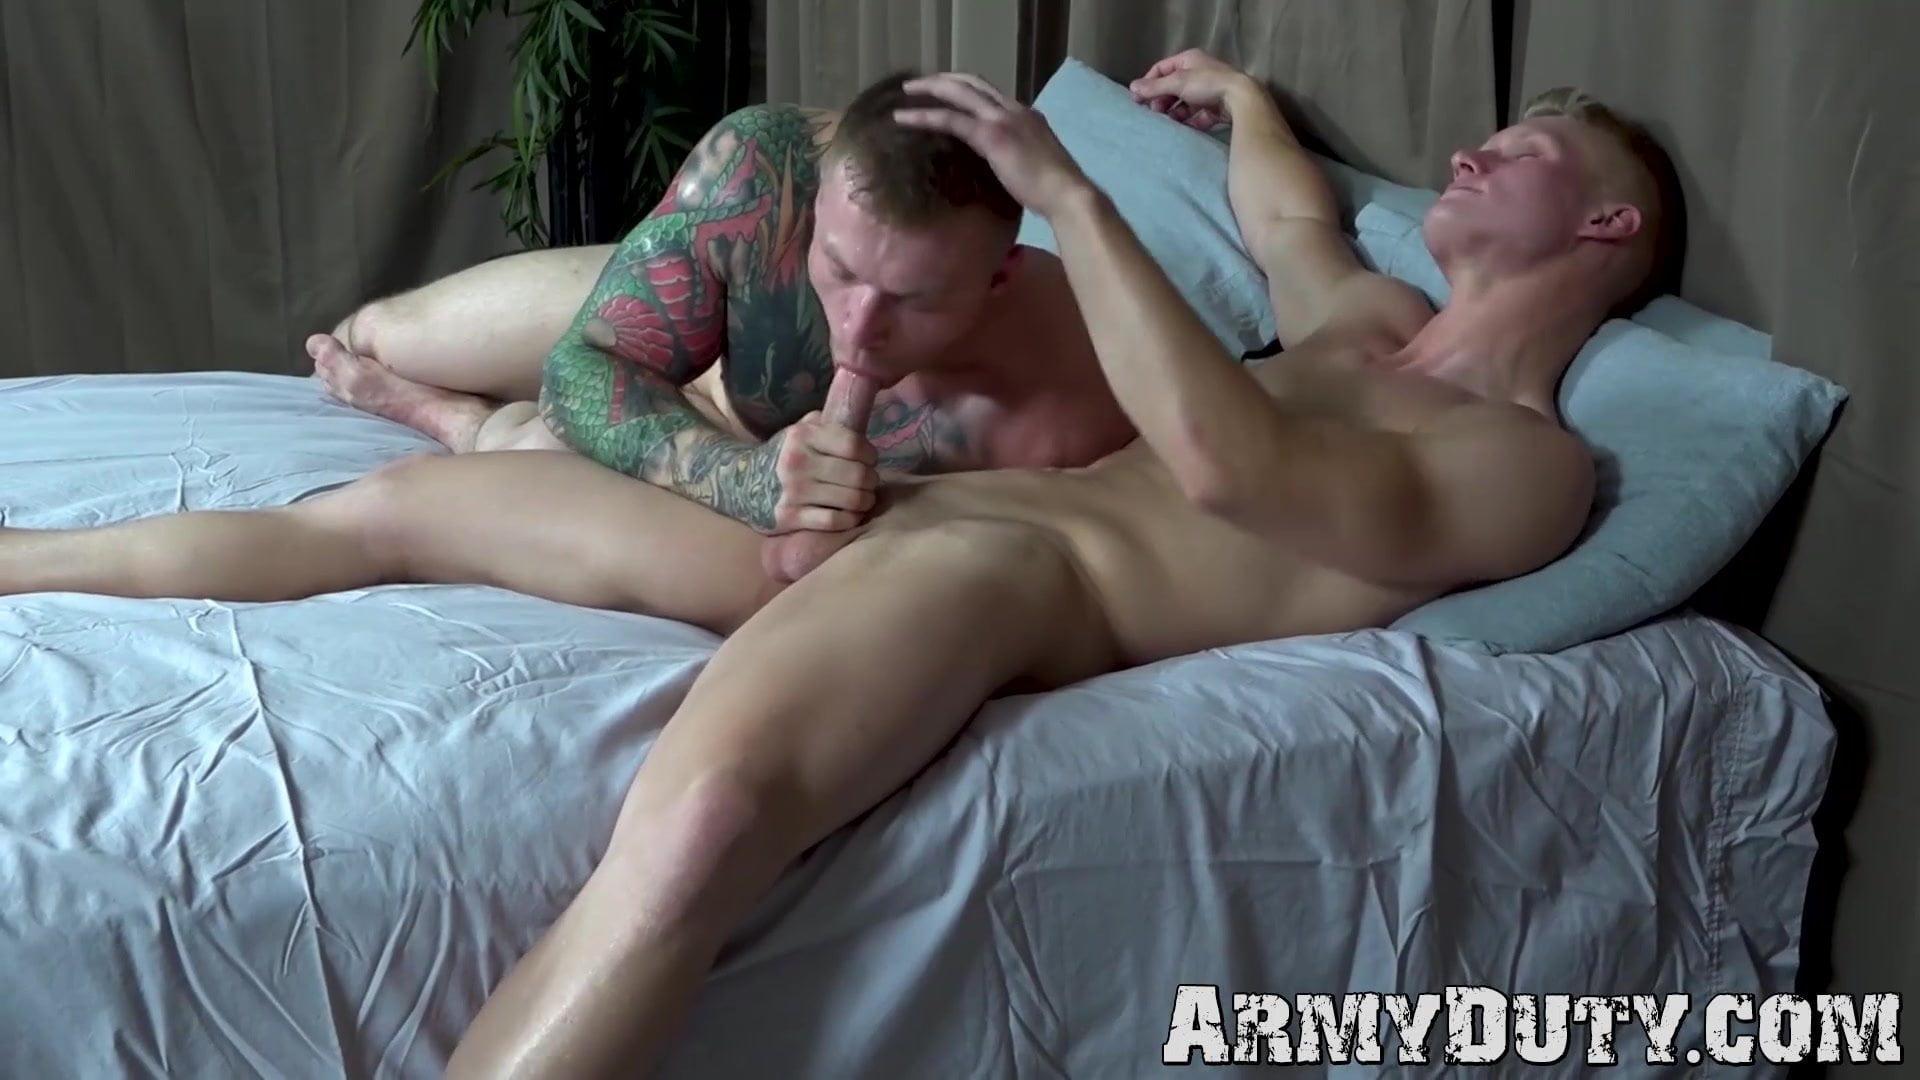 Athletic blond soldier doggystyle barebacks tattooed comrade